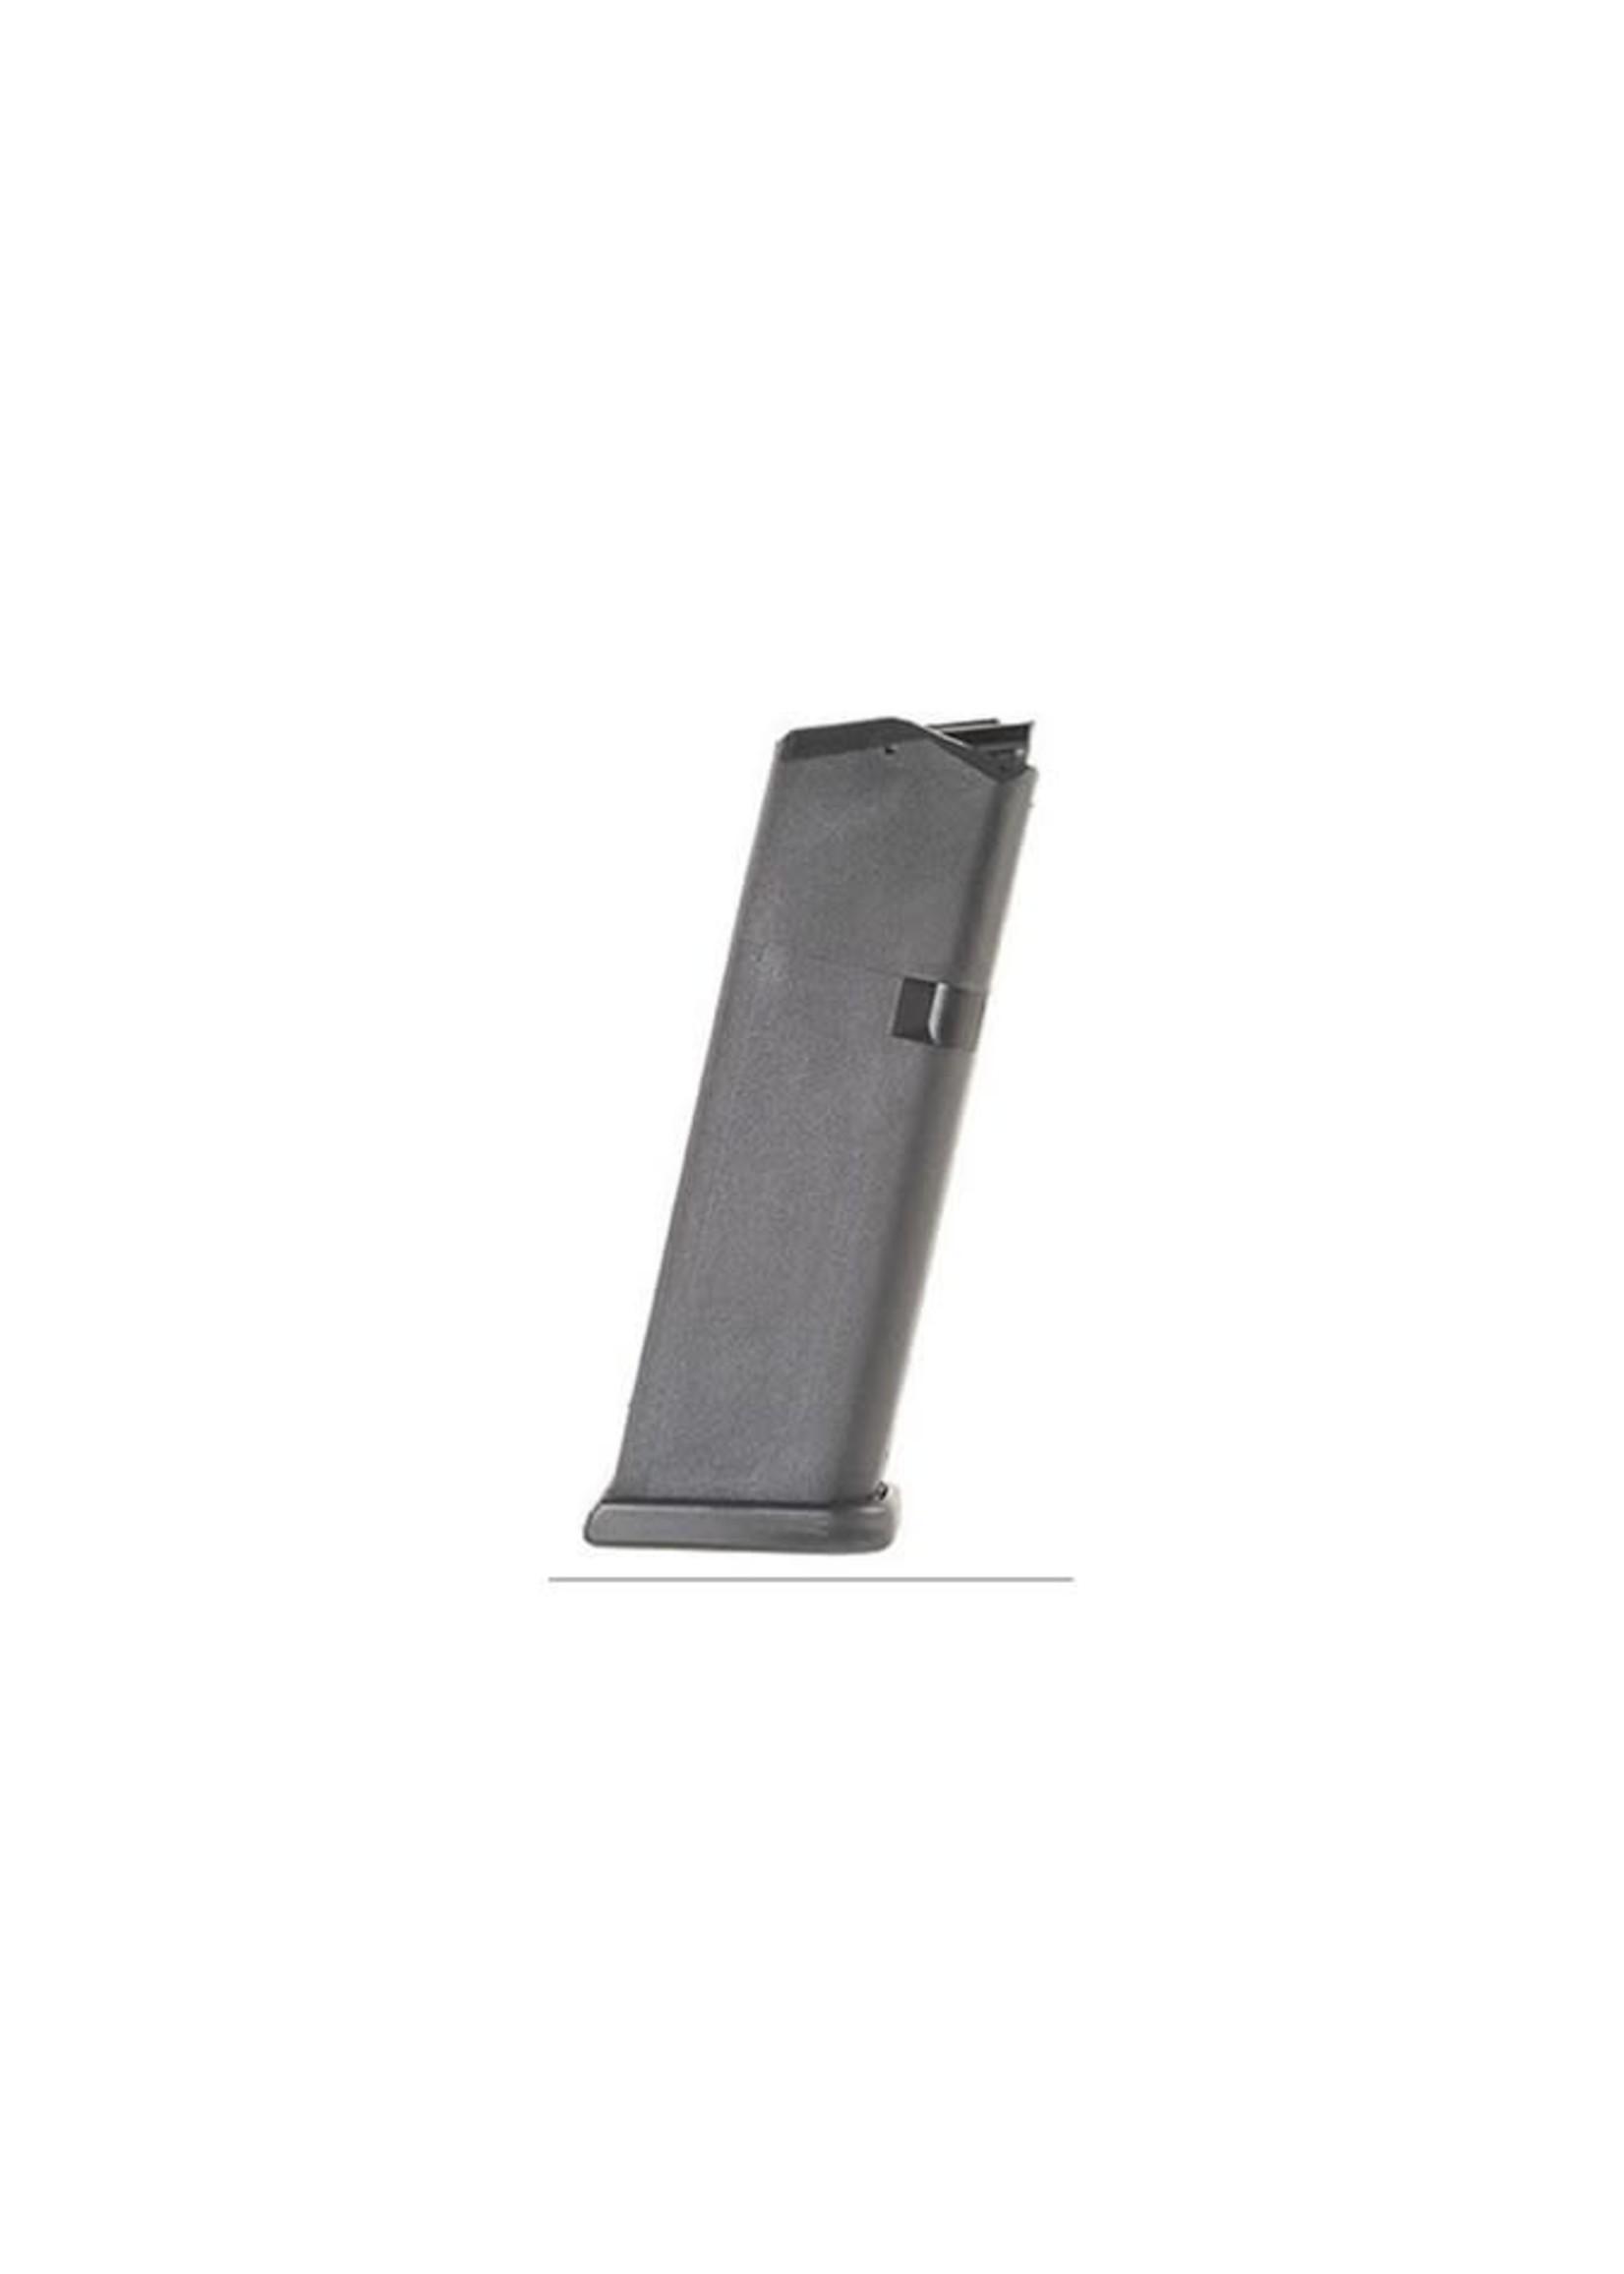 Glock Glock 19 15-Rd Magazine, 9mm